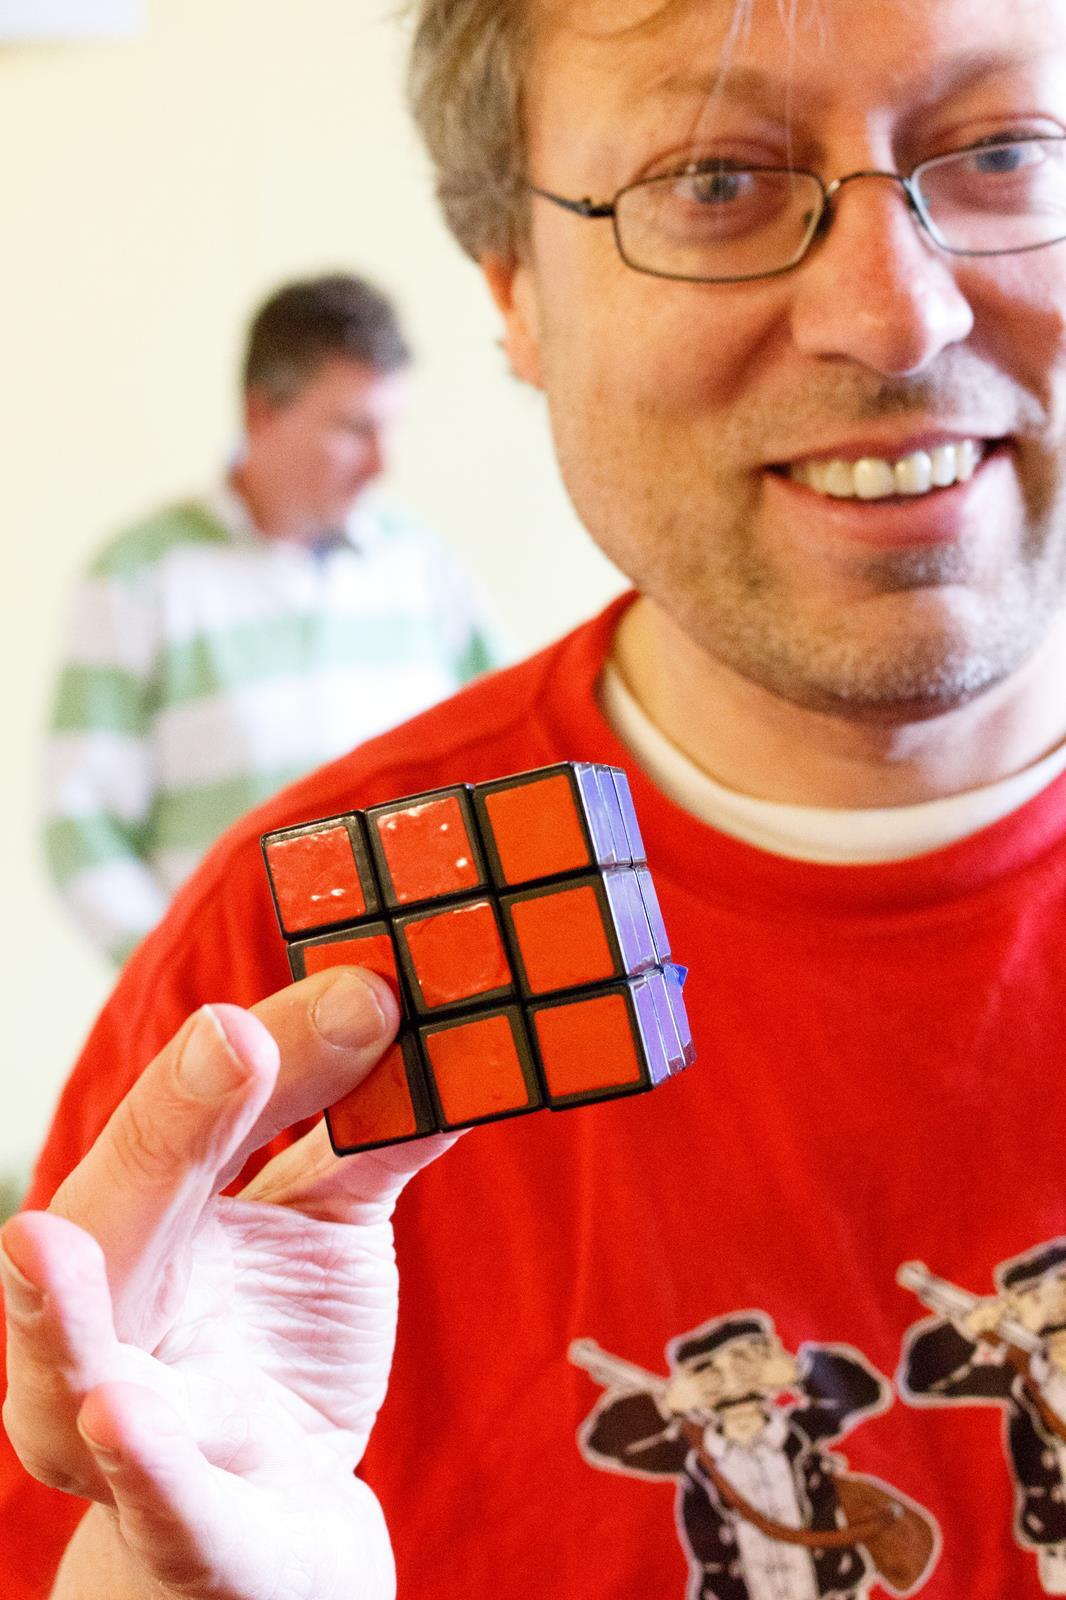 Hiddo Rubiks kubus